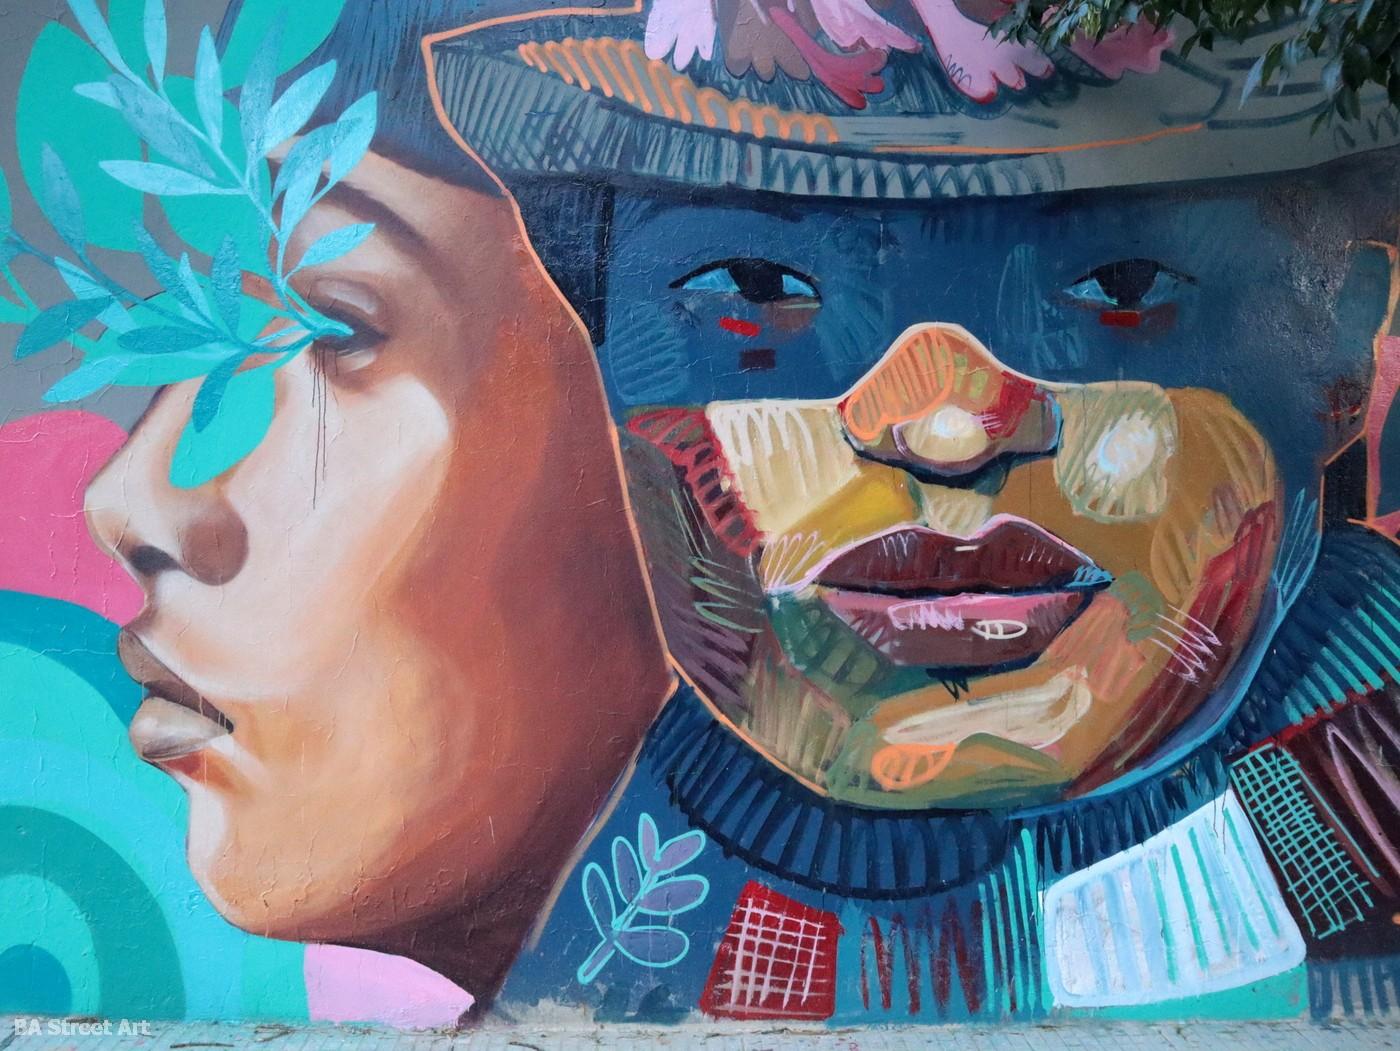 Tikay muralista aner tatu Sebastián Daels muralista buenos aires street art murales